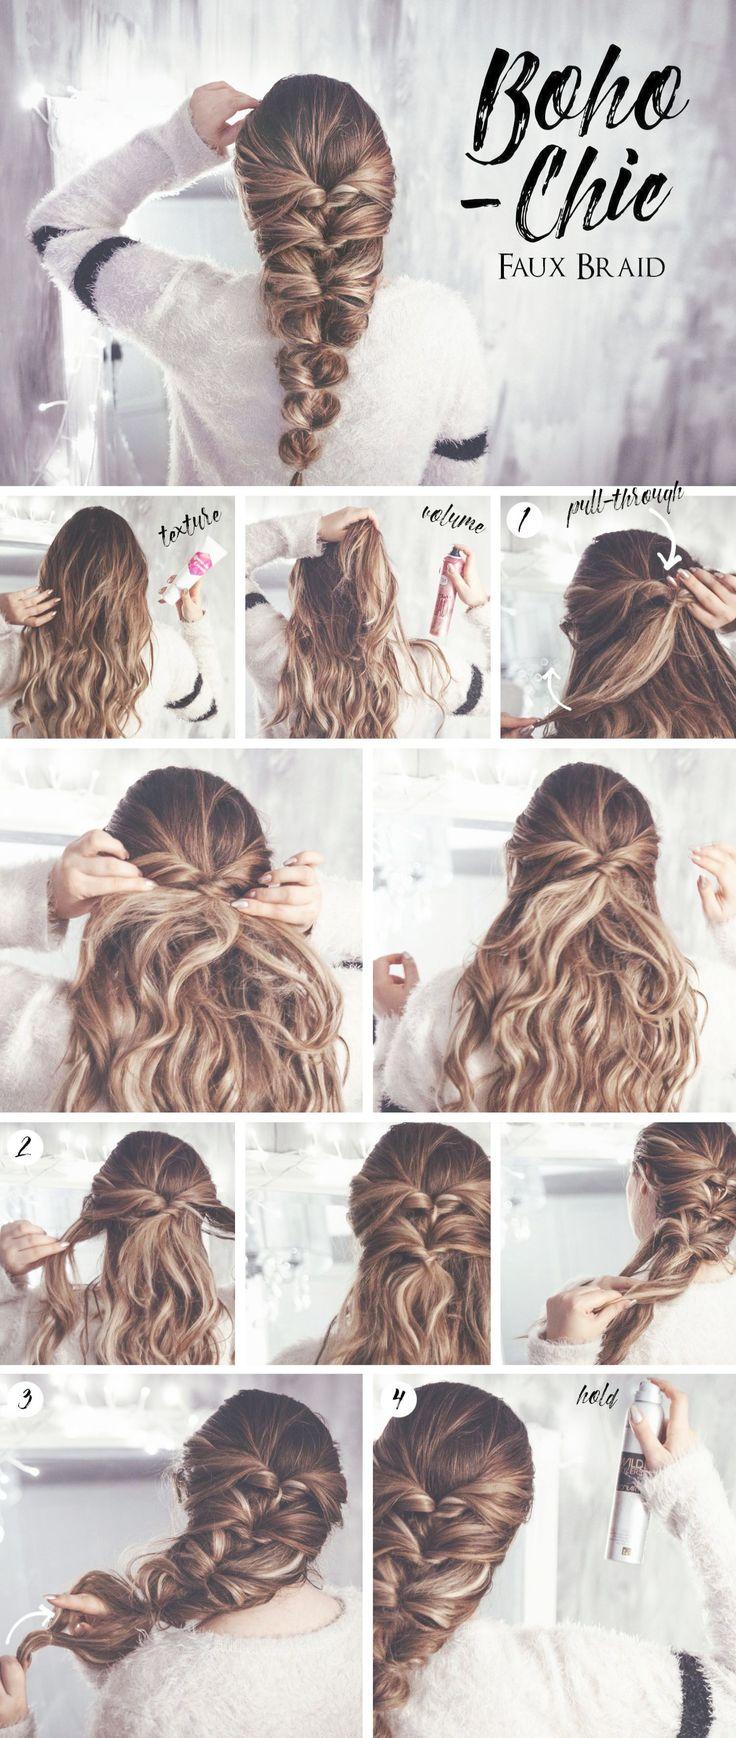 Hairstyles Round Face regarding Hair Salon Jobs Near Me